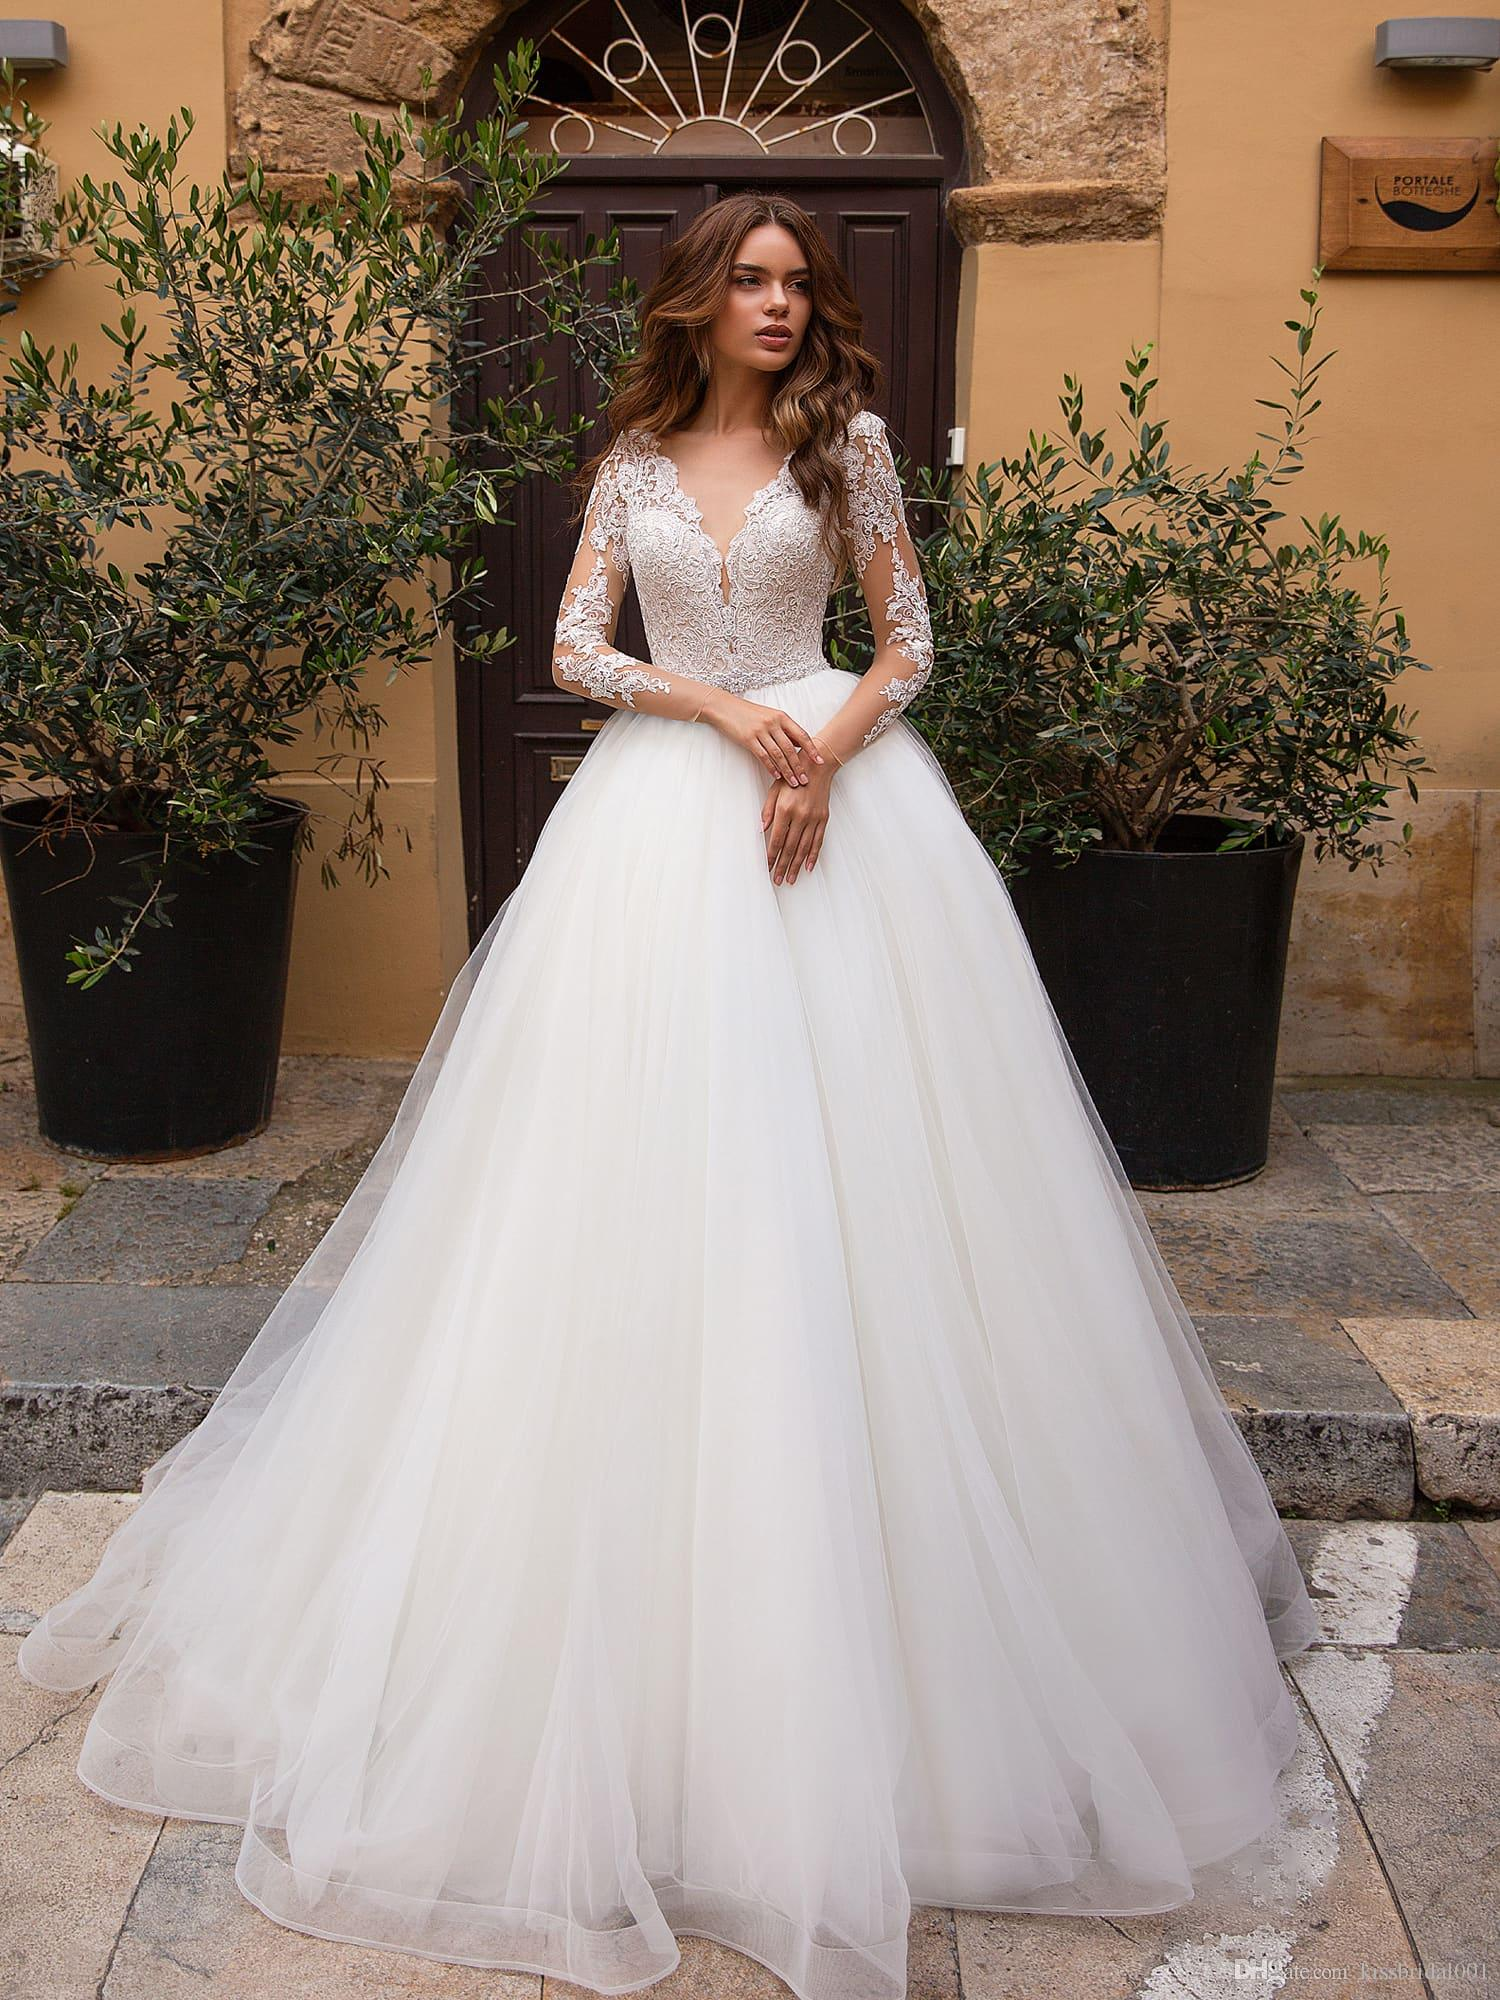 27e8e25b68ad Discount Corset Wedding Dresses Long Sleeve Deep V Neckline Lace Wedding  Dress Bridal Gowns Bride Formal Gown Cheap Bride Dresses Christian Wedding  Dresses ...